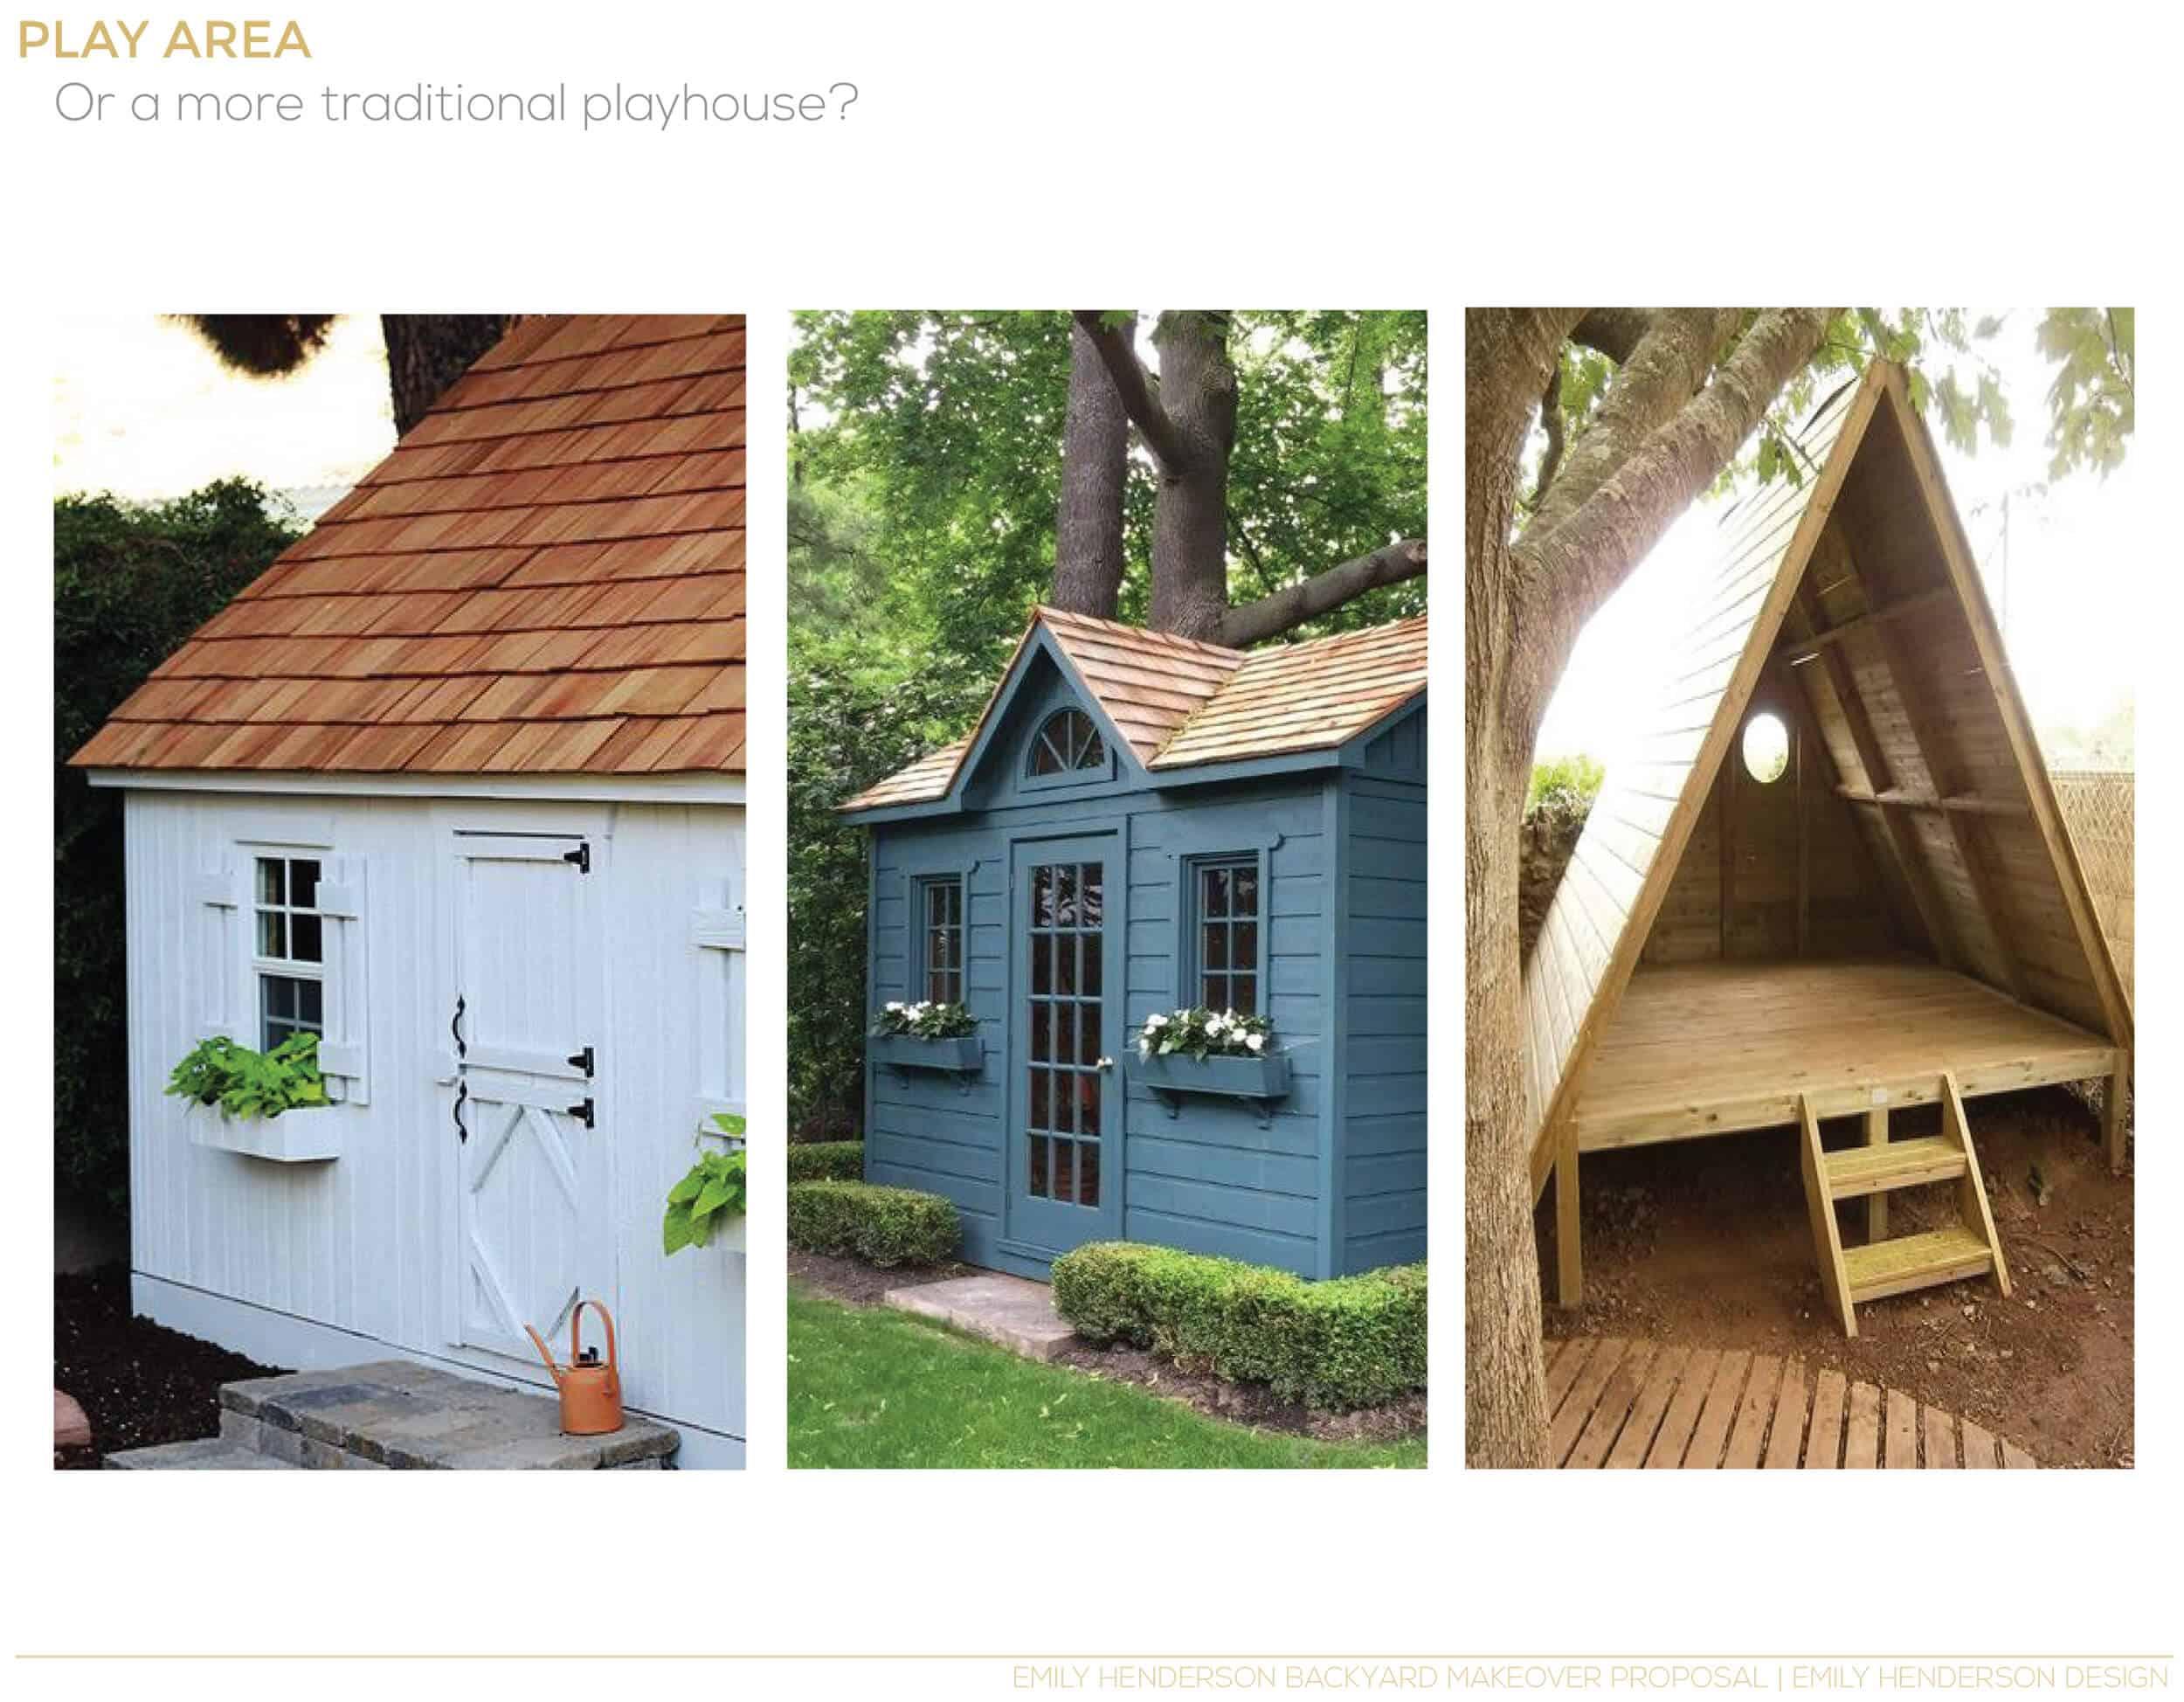 emily-henderson_waverly_backyard-makeover-proposal_2016-13